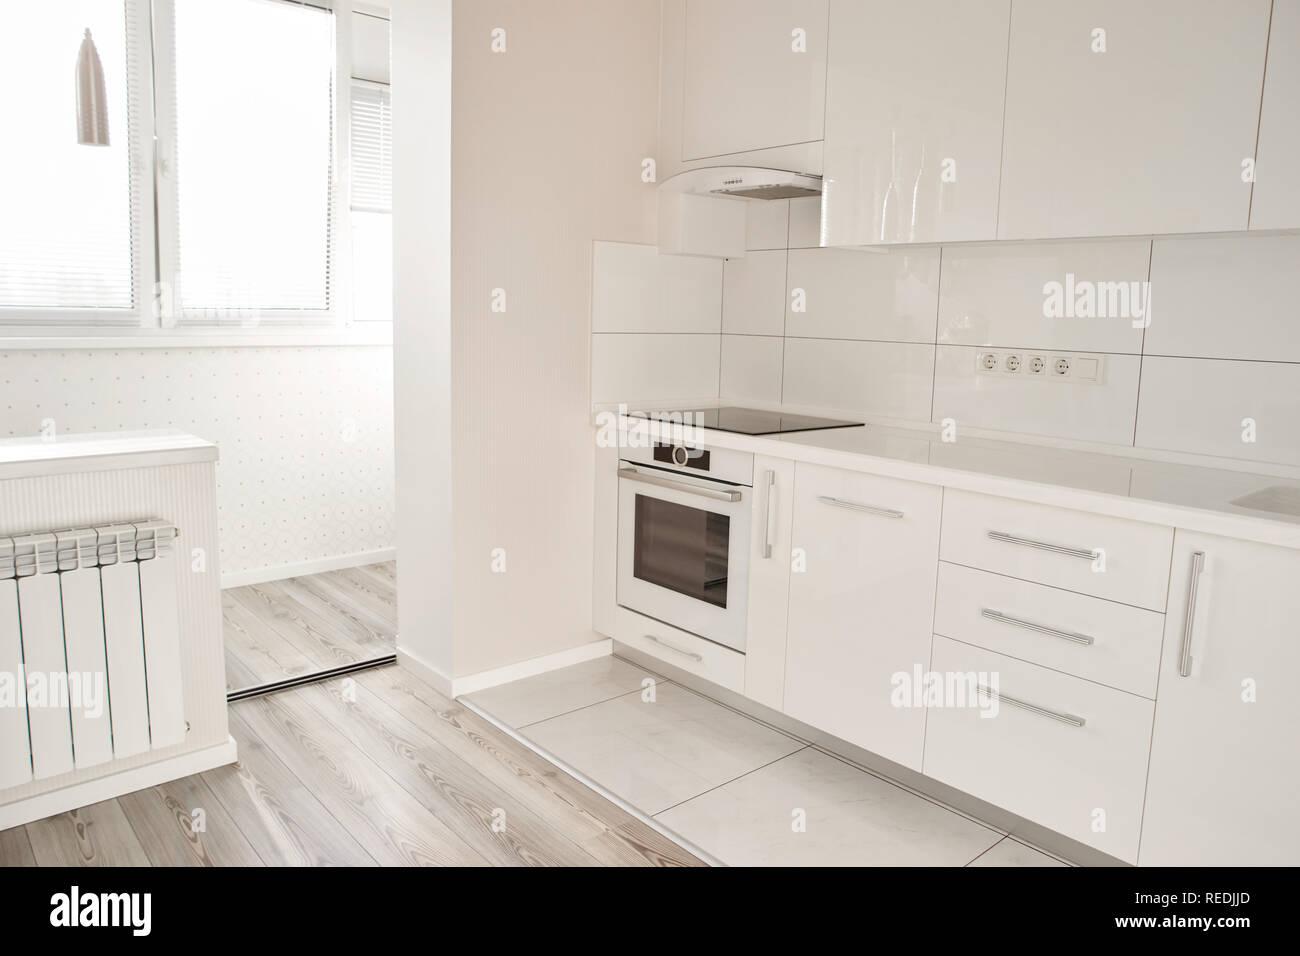 Luxury modern kitchen in new apartment. New white kitchen with ...